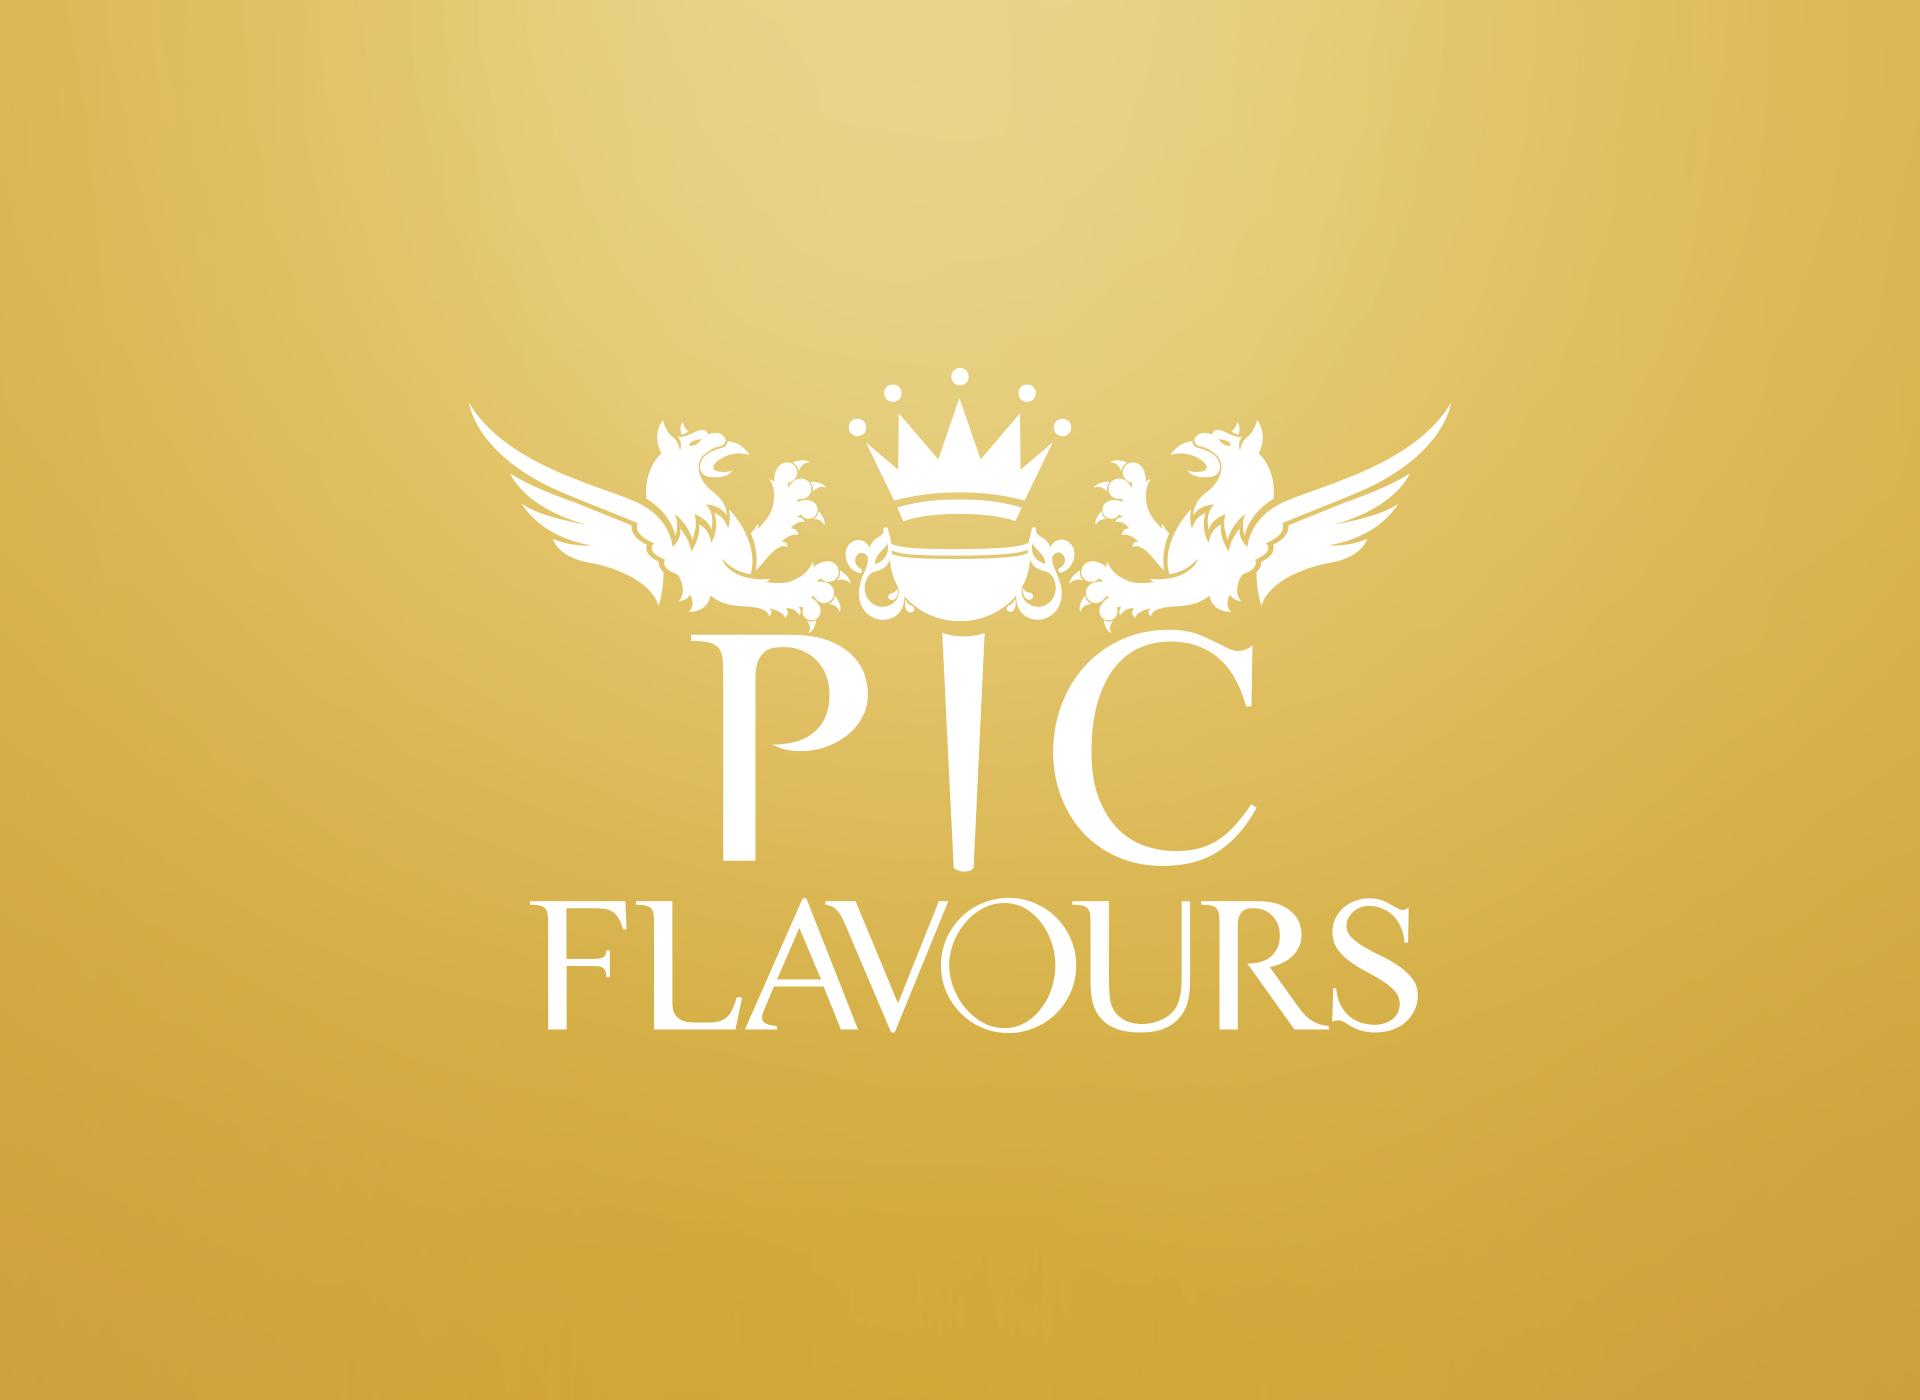 pic flavours logo portofoliu inoveo